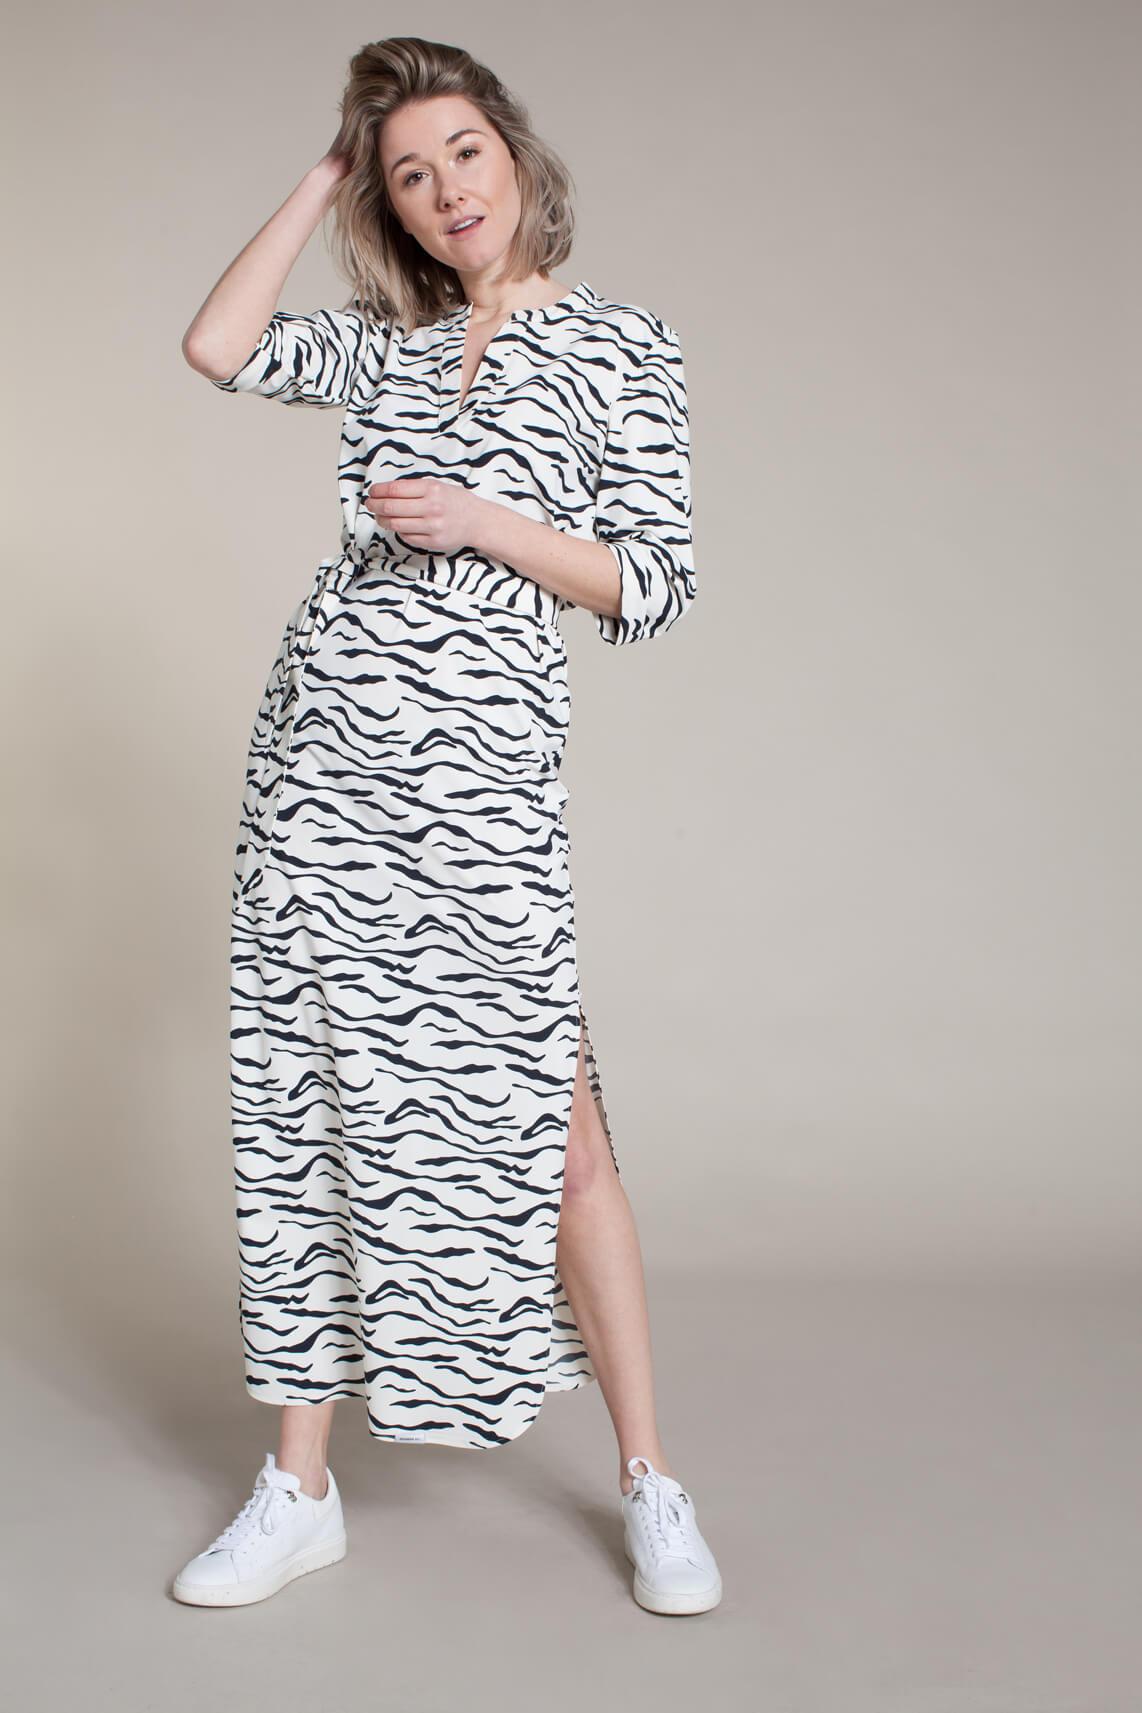 Penn & Ink Dames Jurk met zebraprint wit